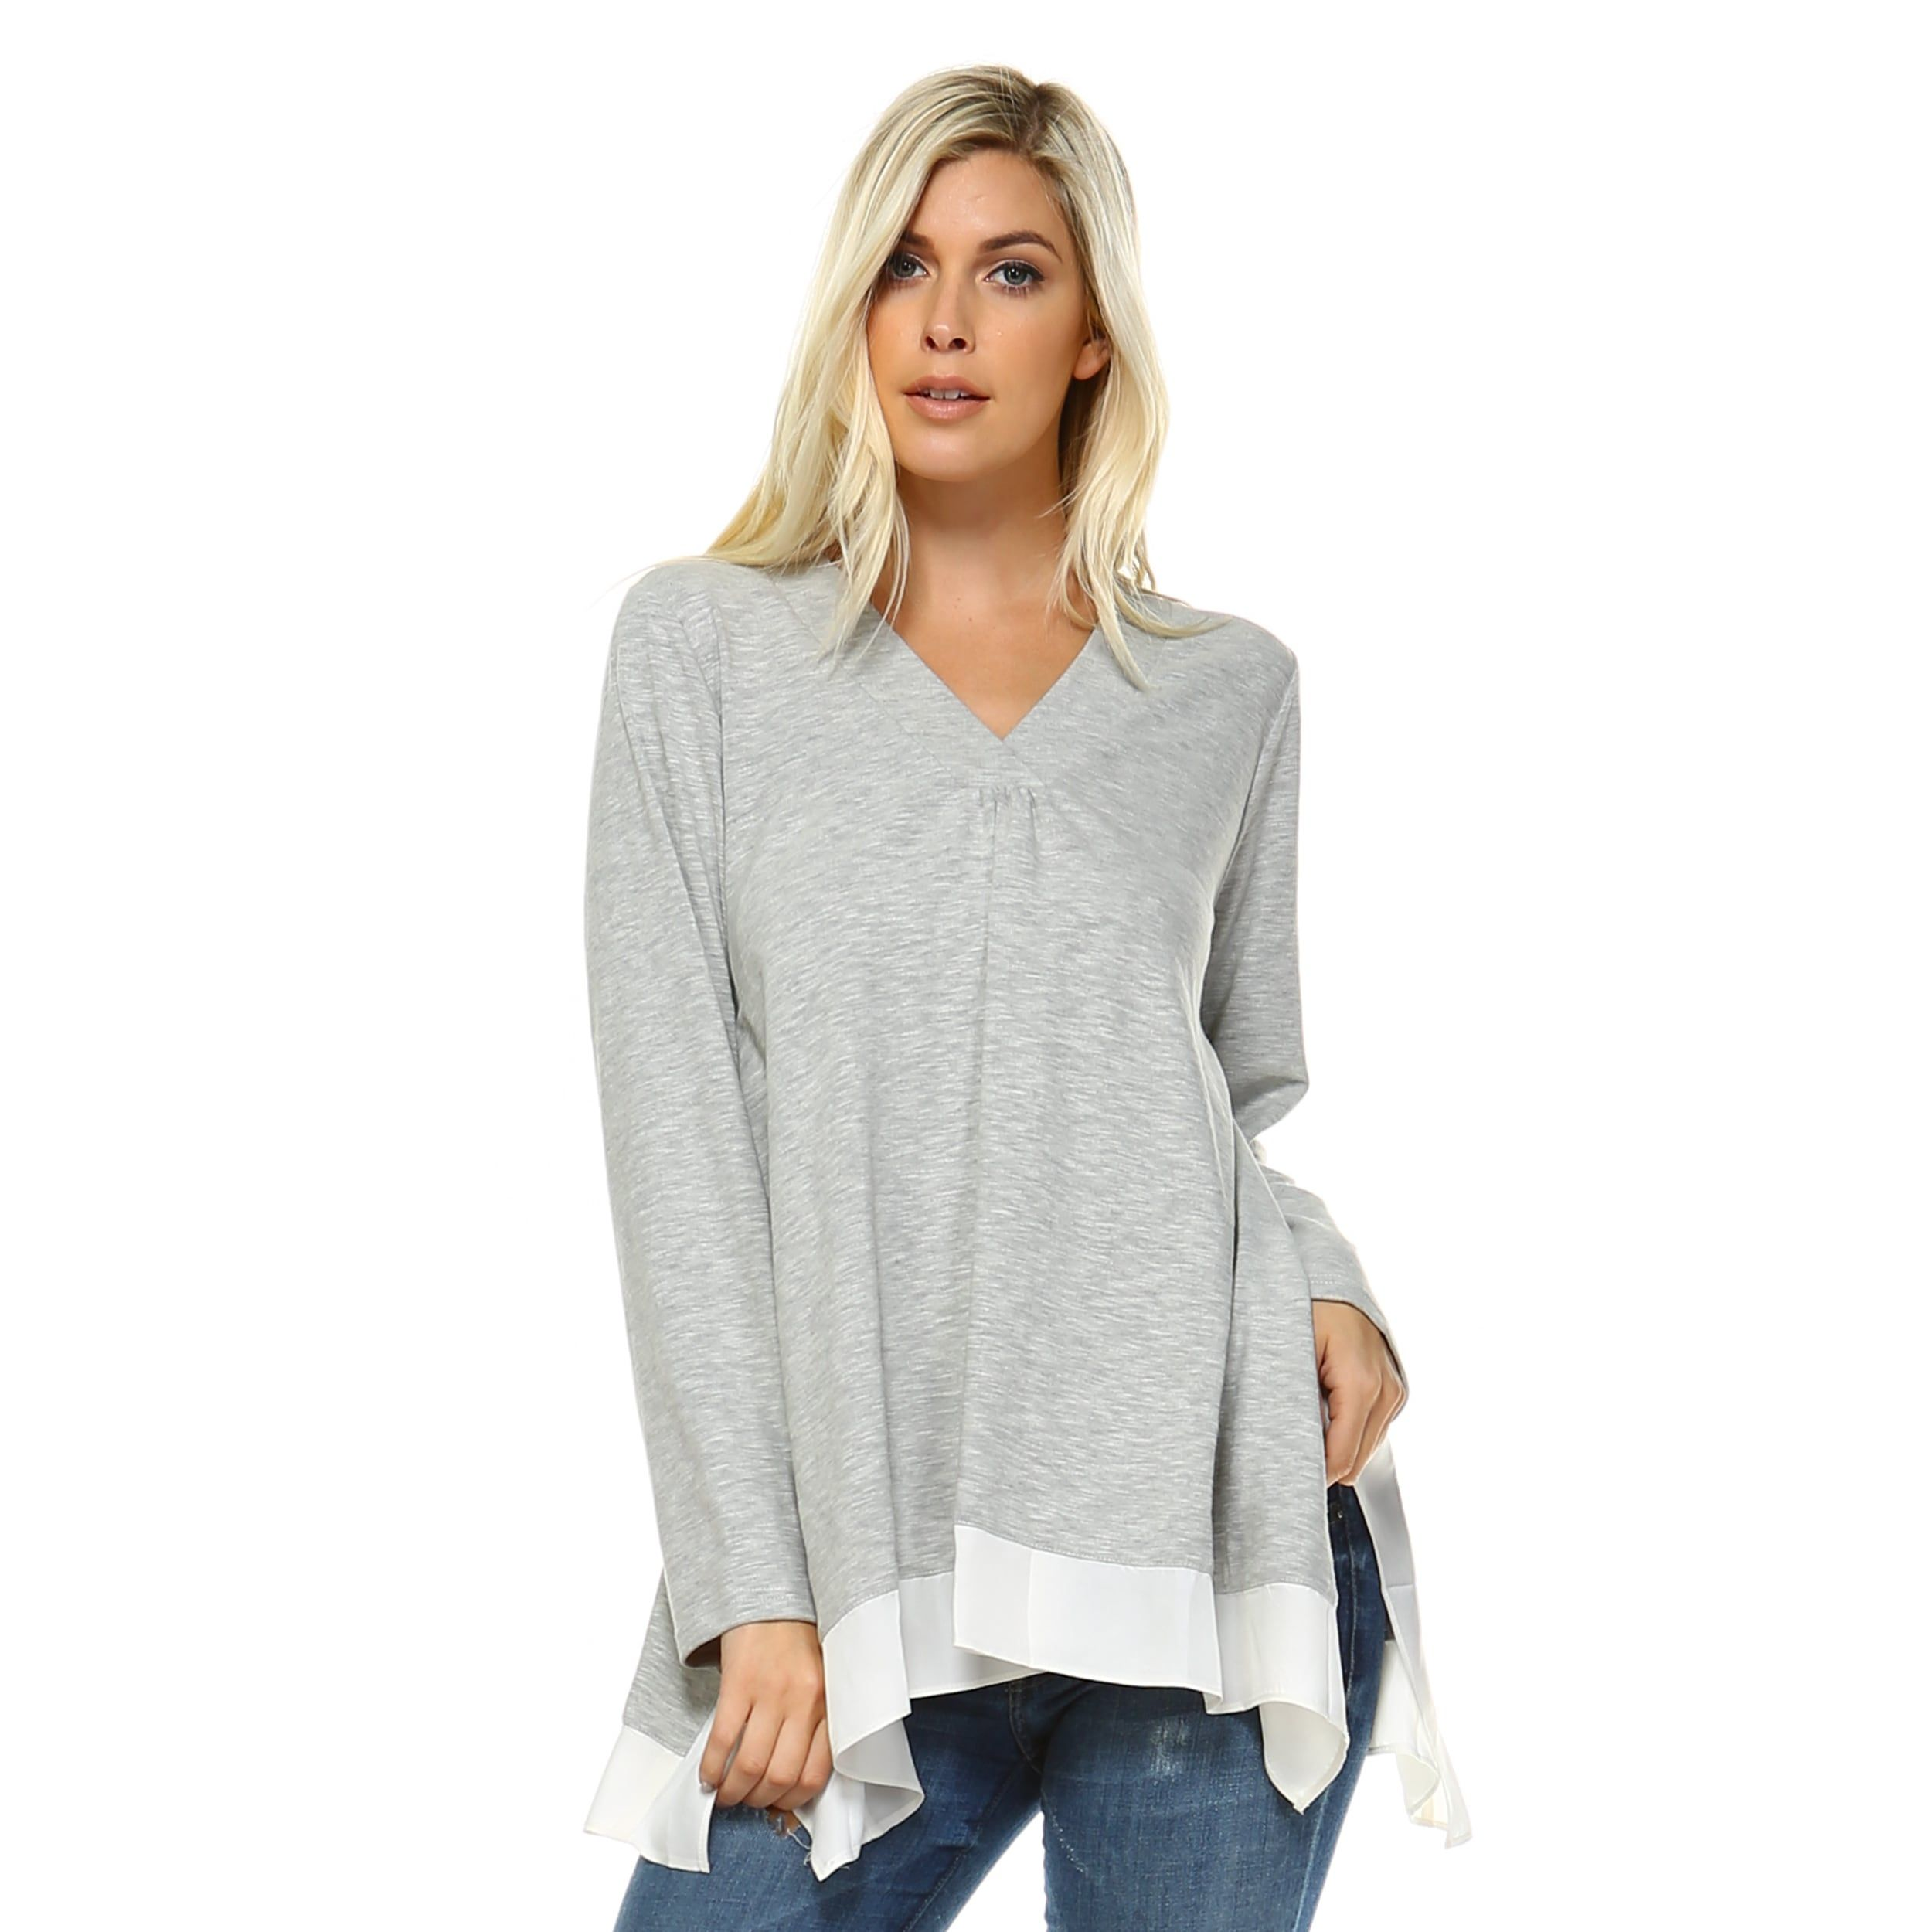 834270ecc974c Overstock.com  Online Shopping - Bedding